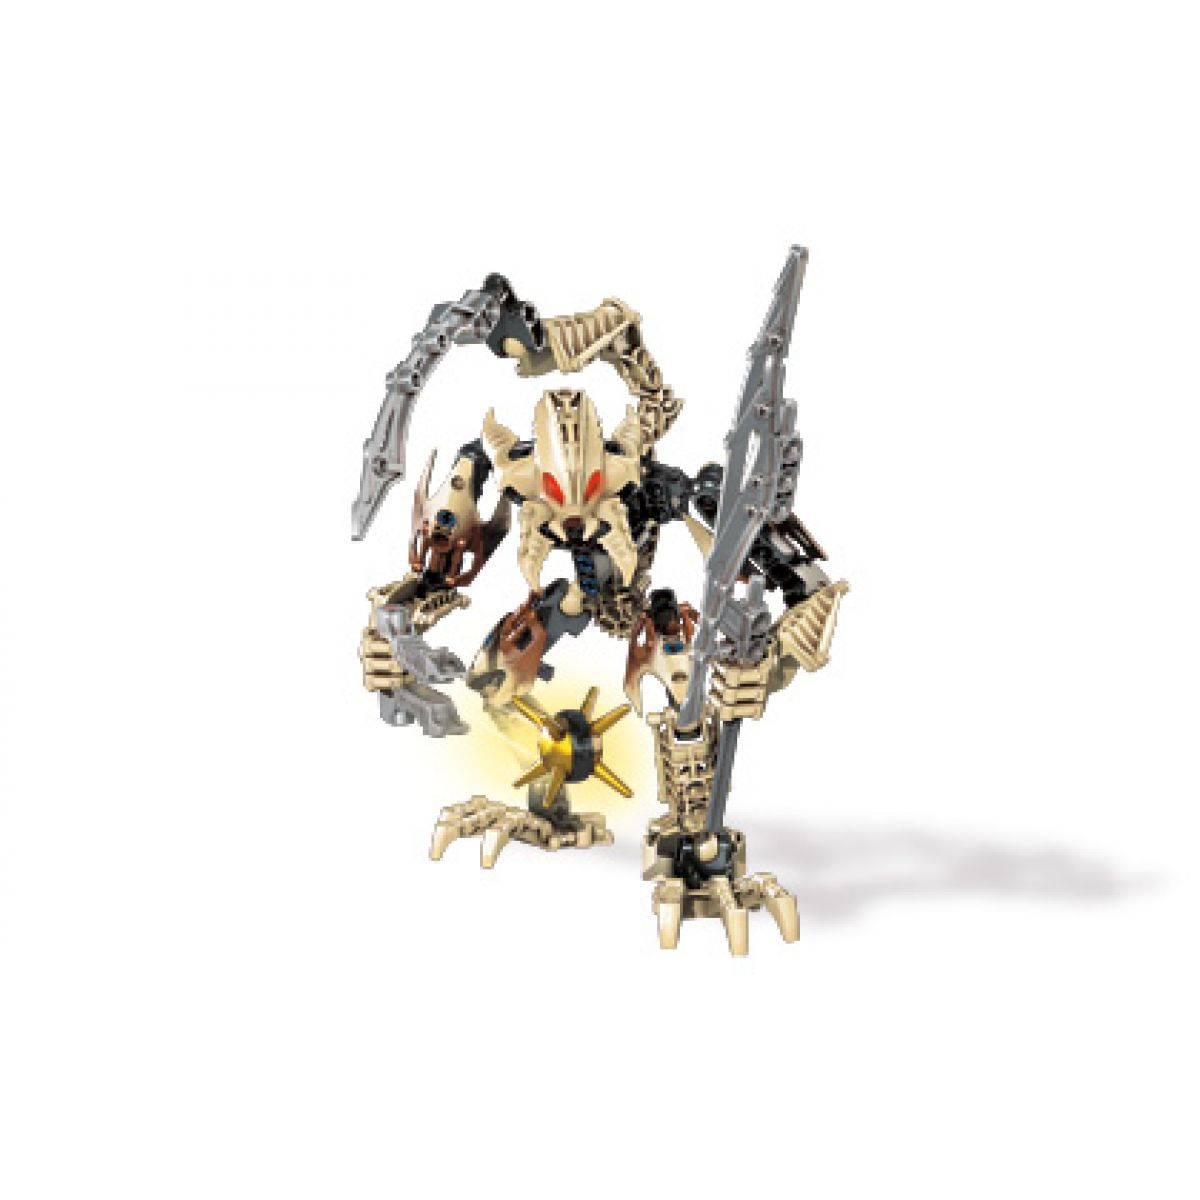 LEGO BIONICLE Glatorian Vorox